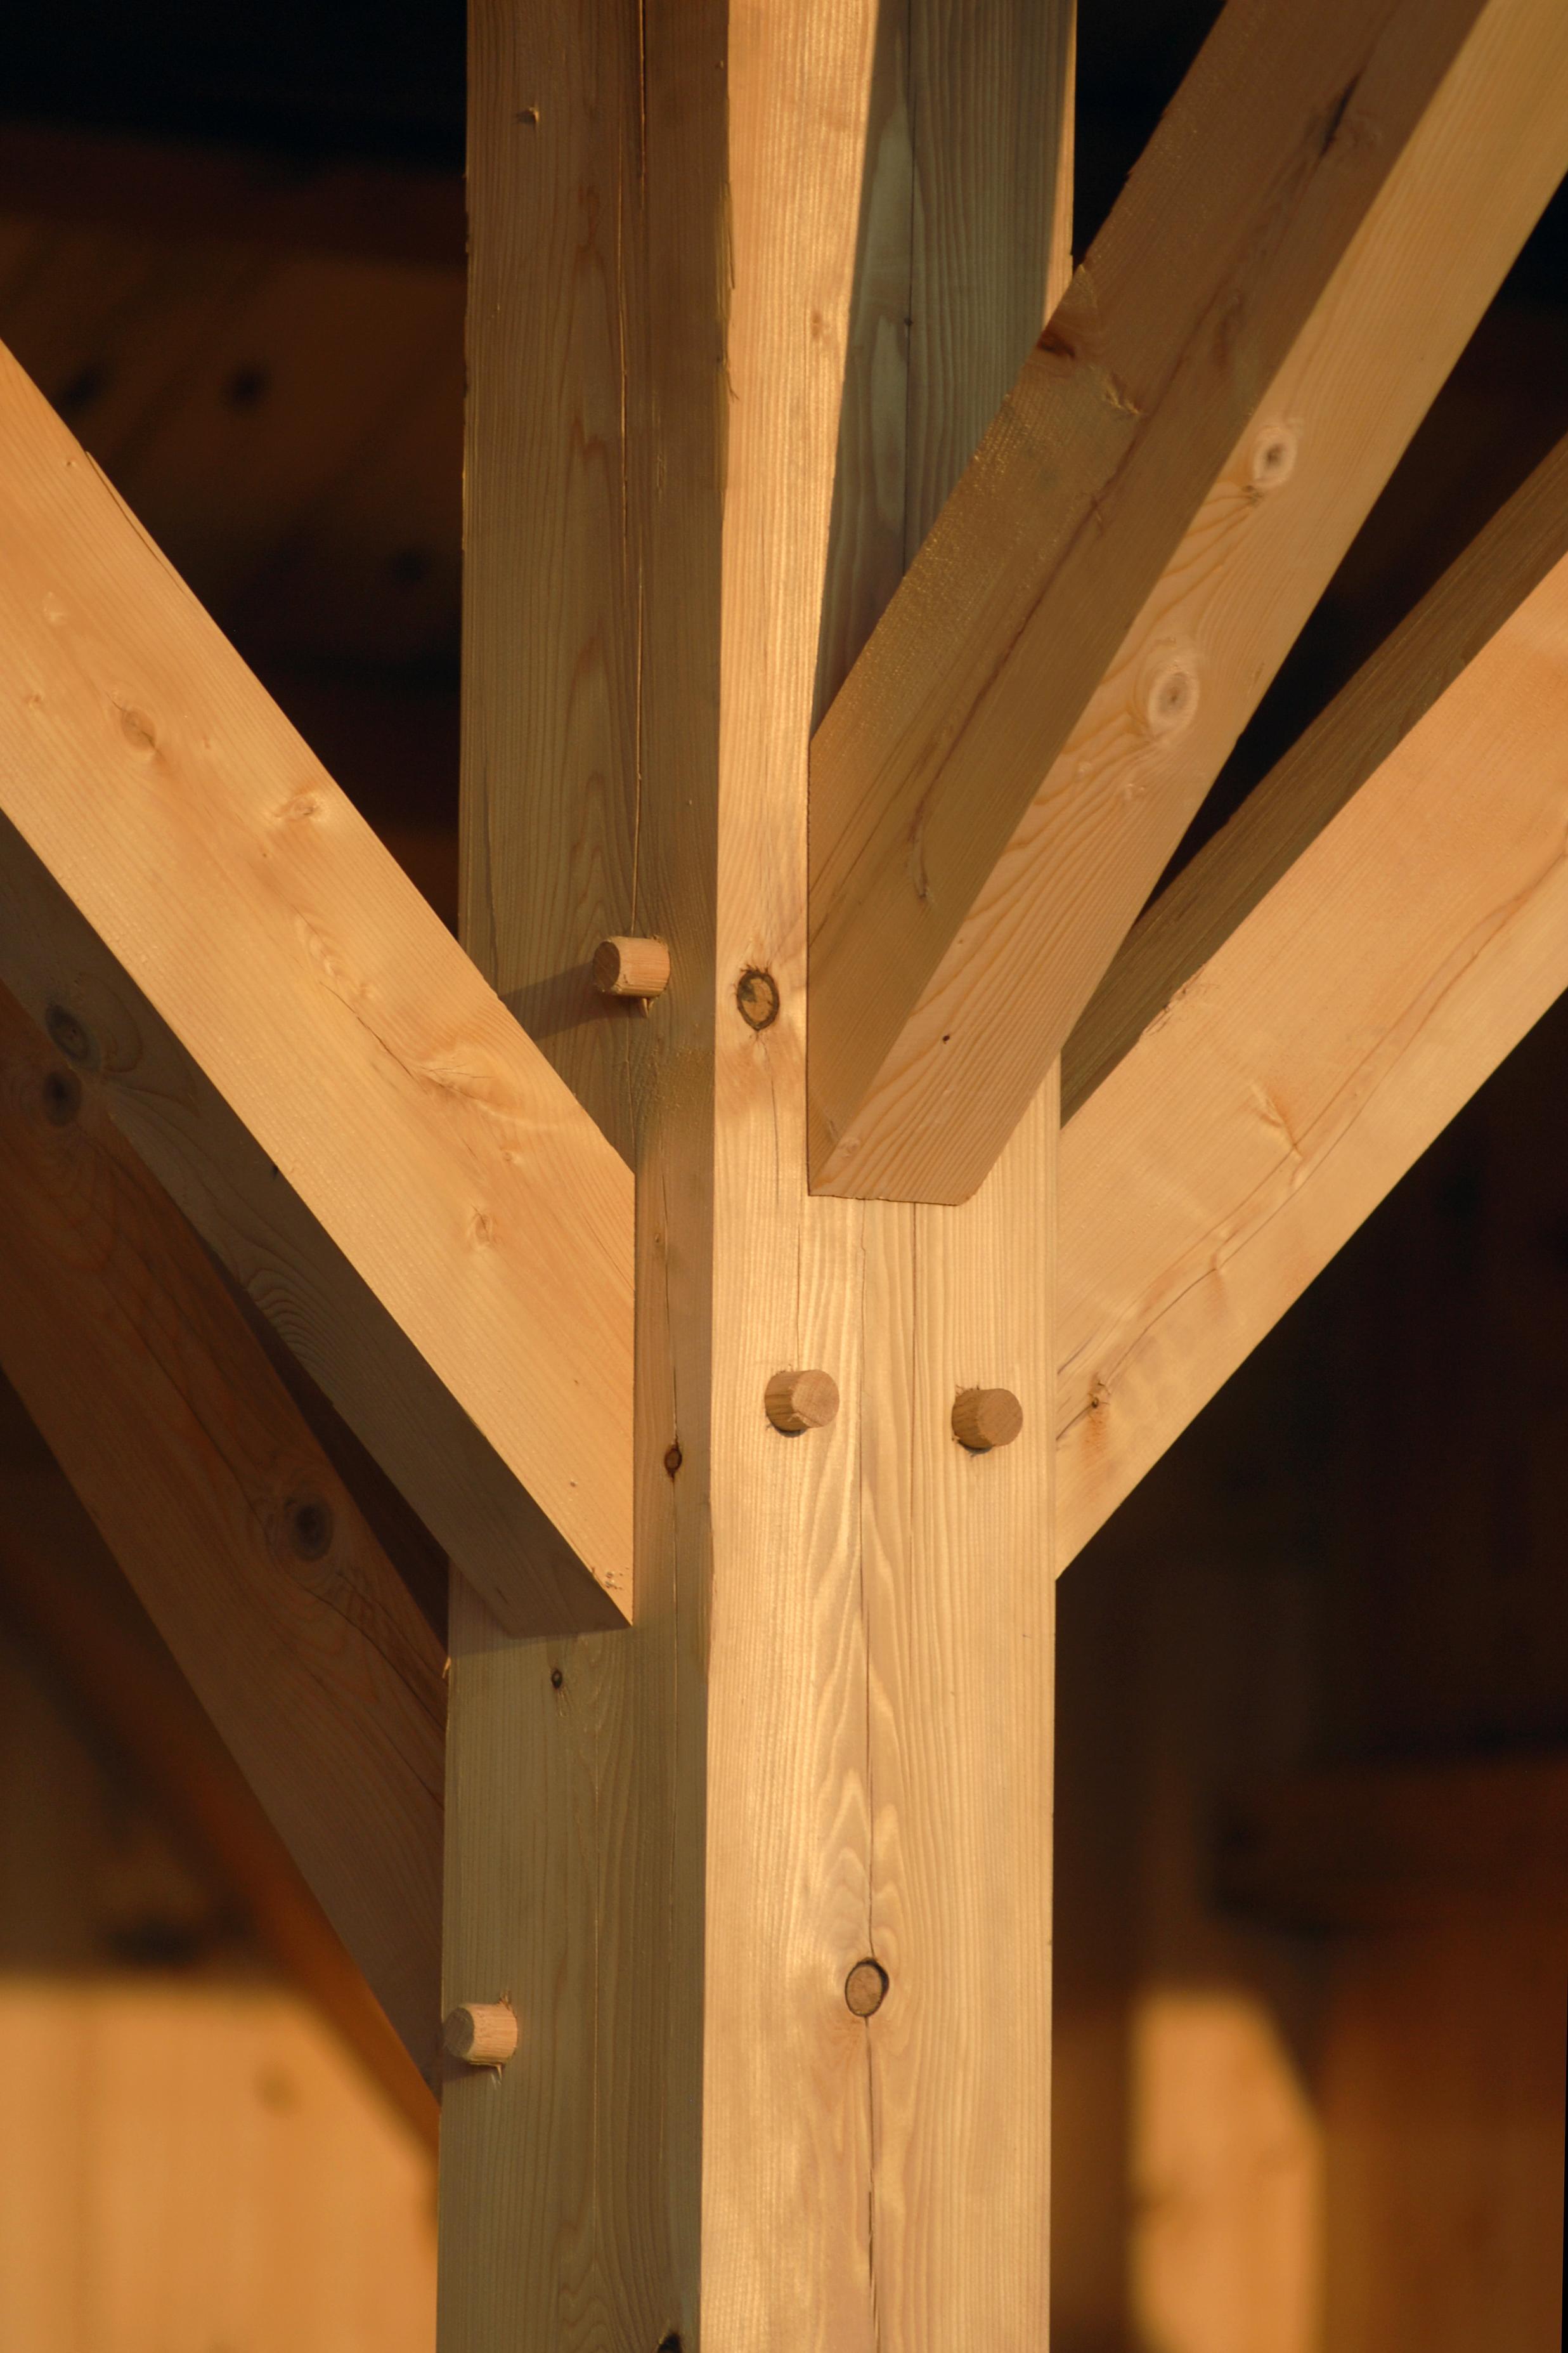 Lean To Carport Convex Beam End Green Oak Douglas Fir Bespoke Designs Available High Quality